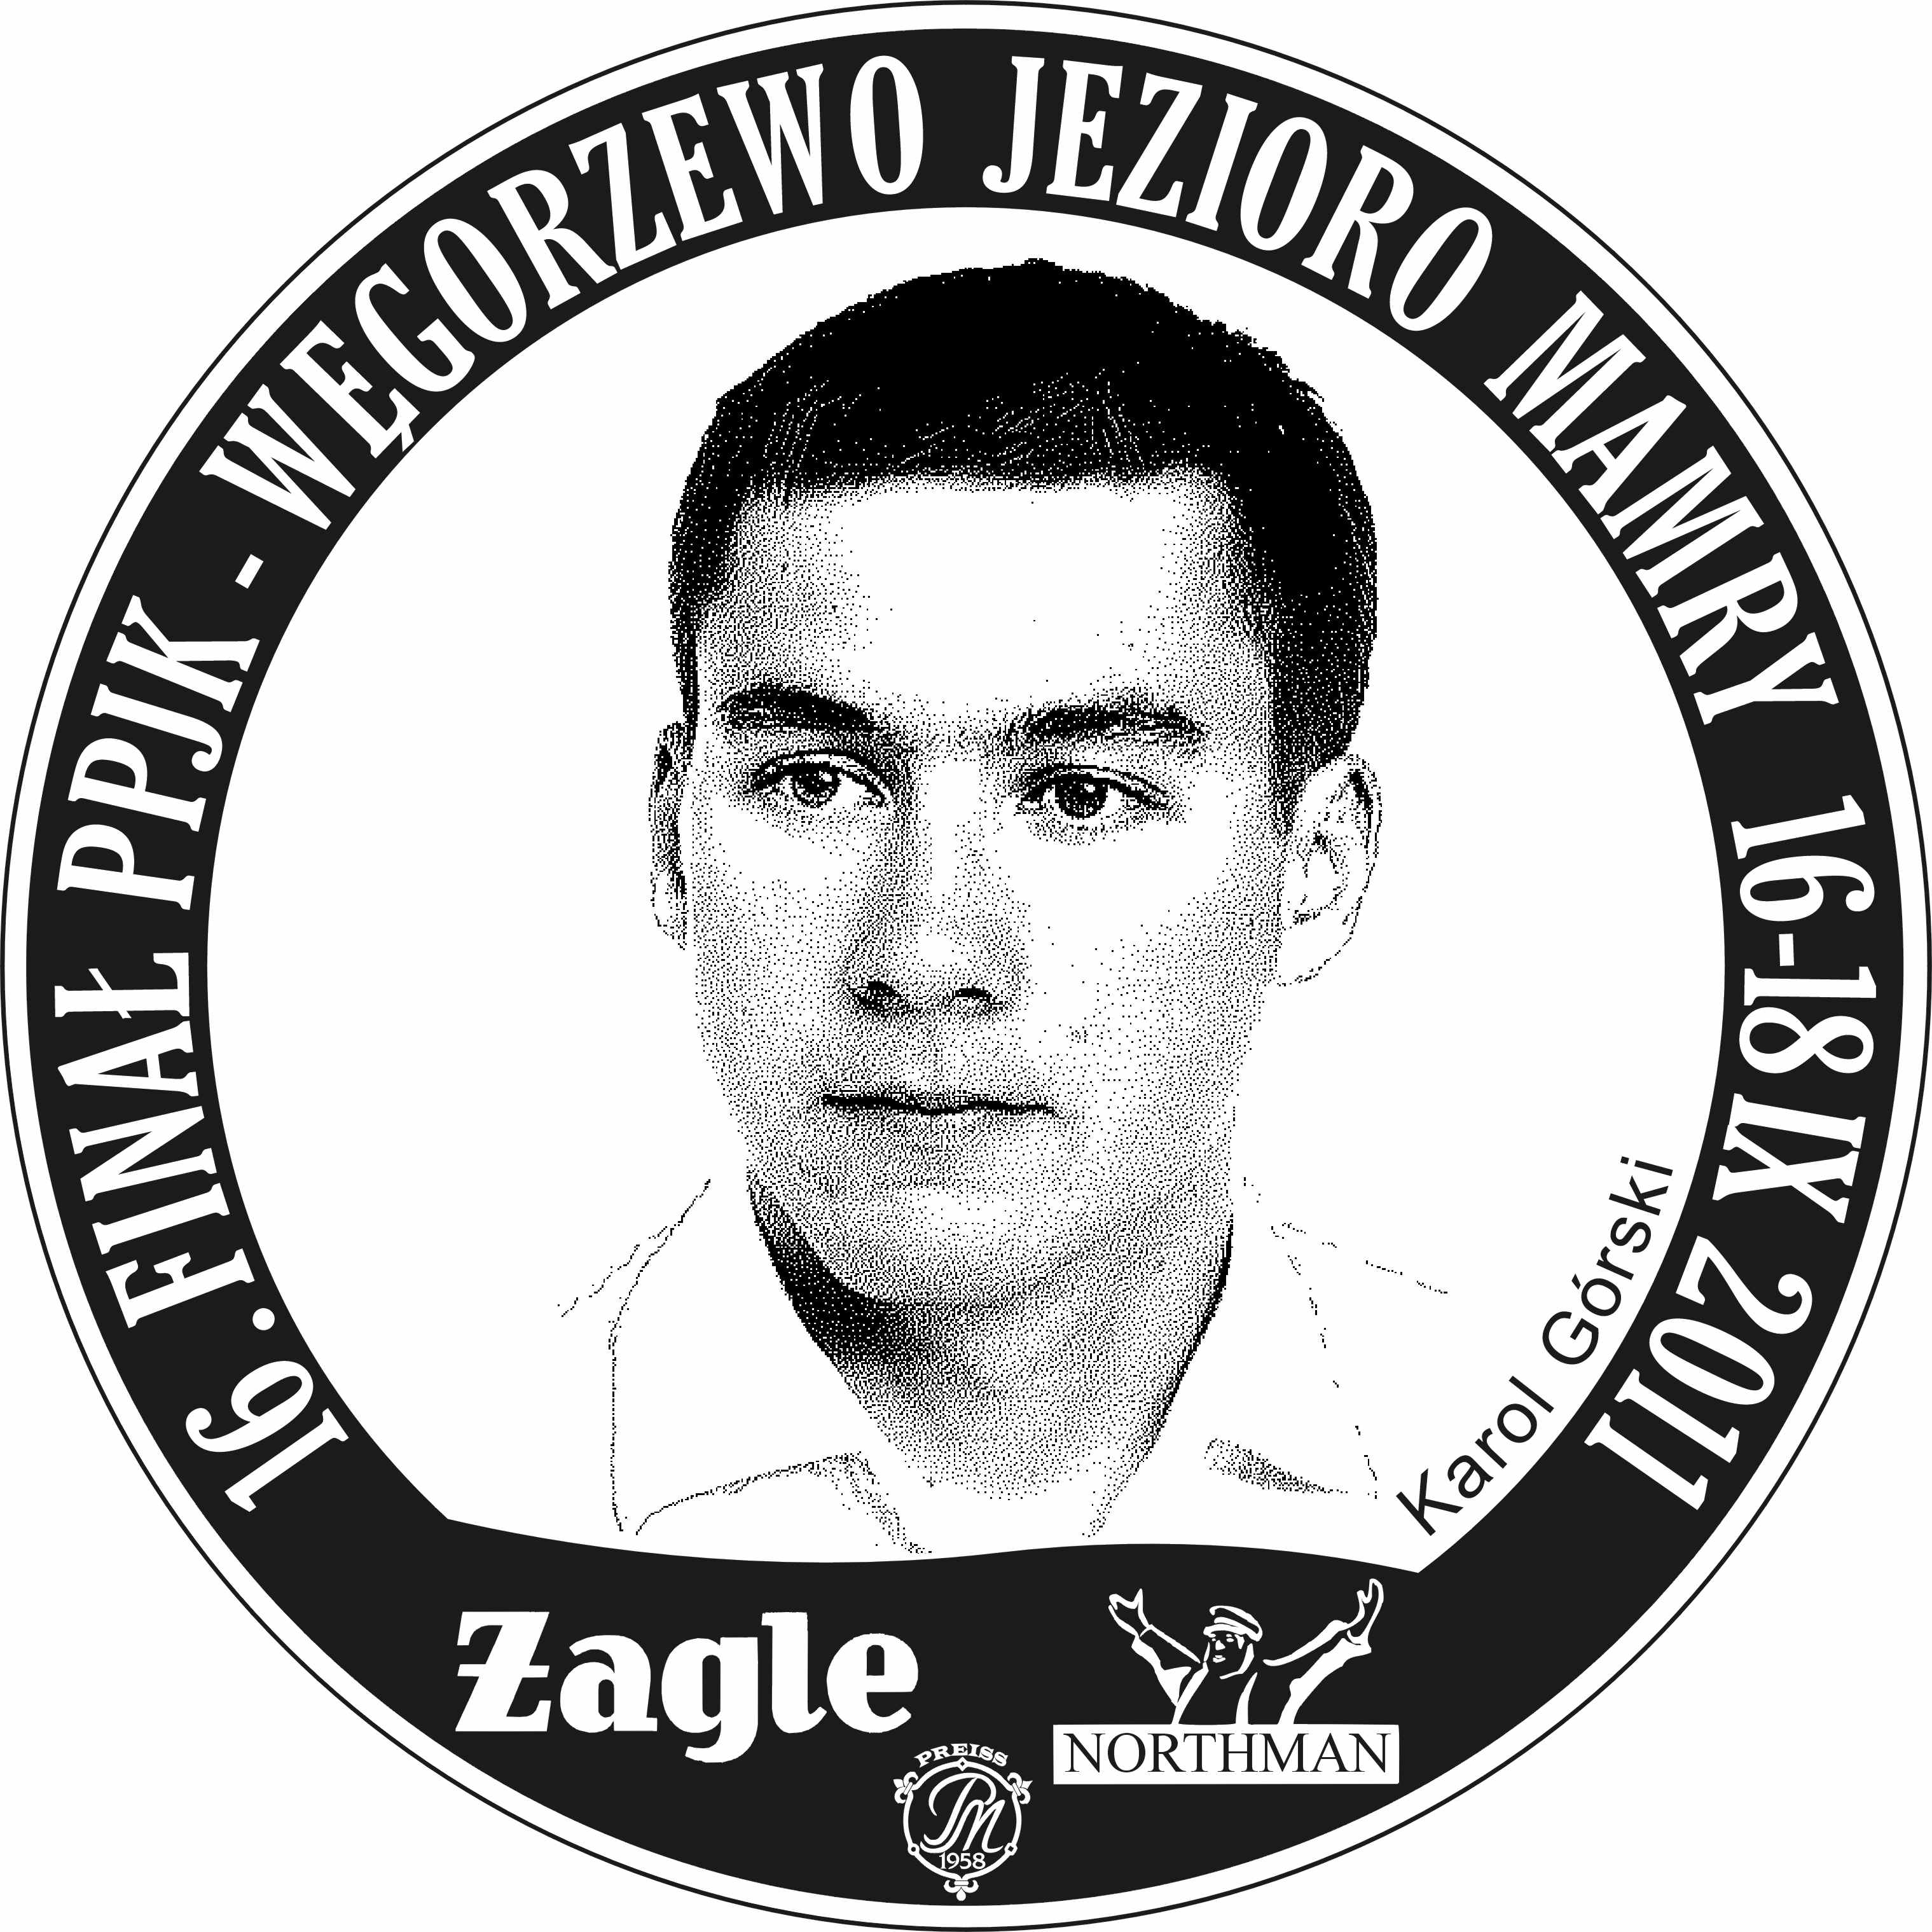 projeky_medalu